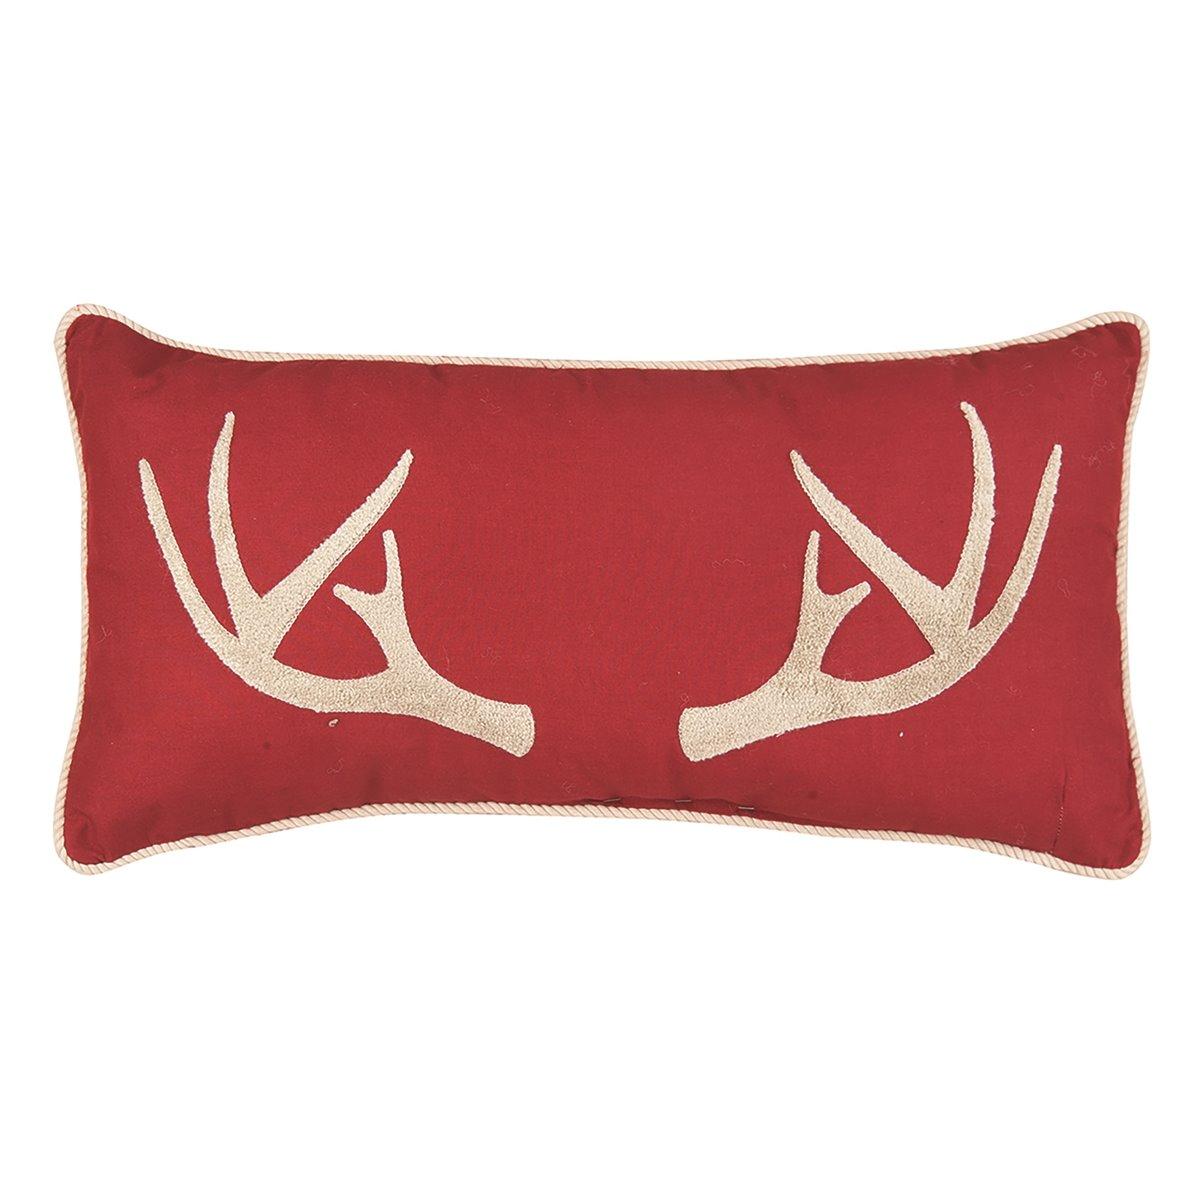 Tufted Antler Pillow